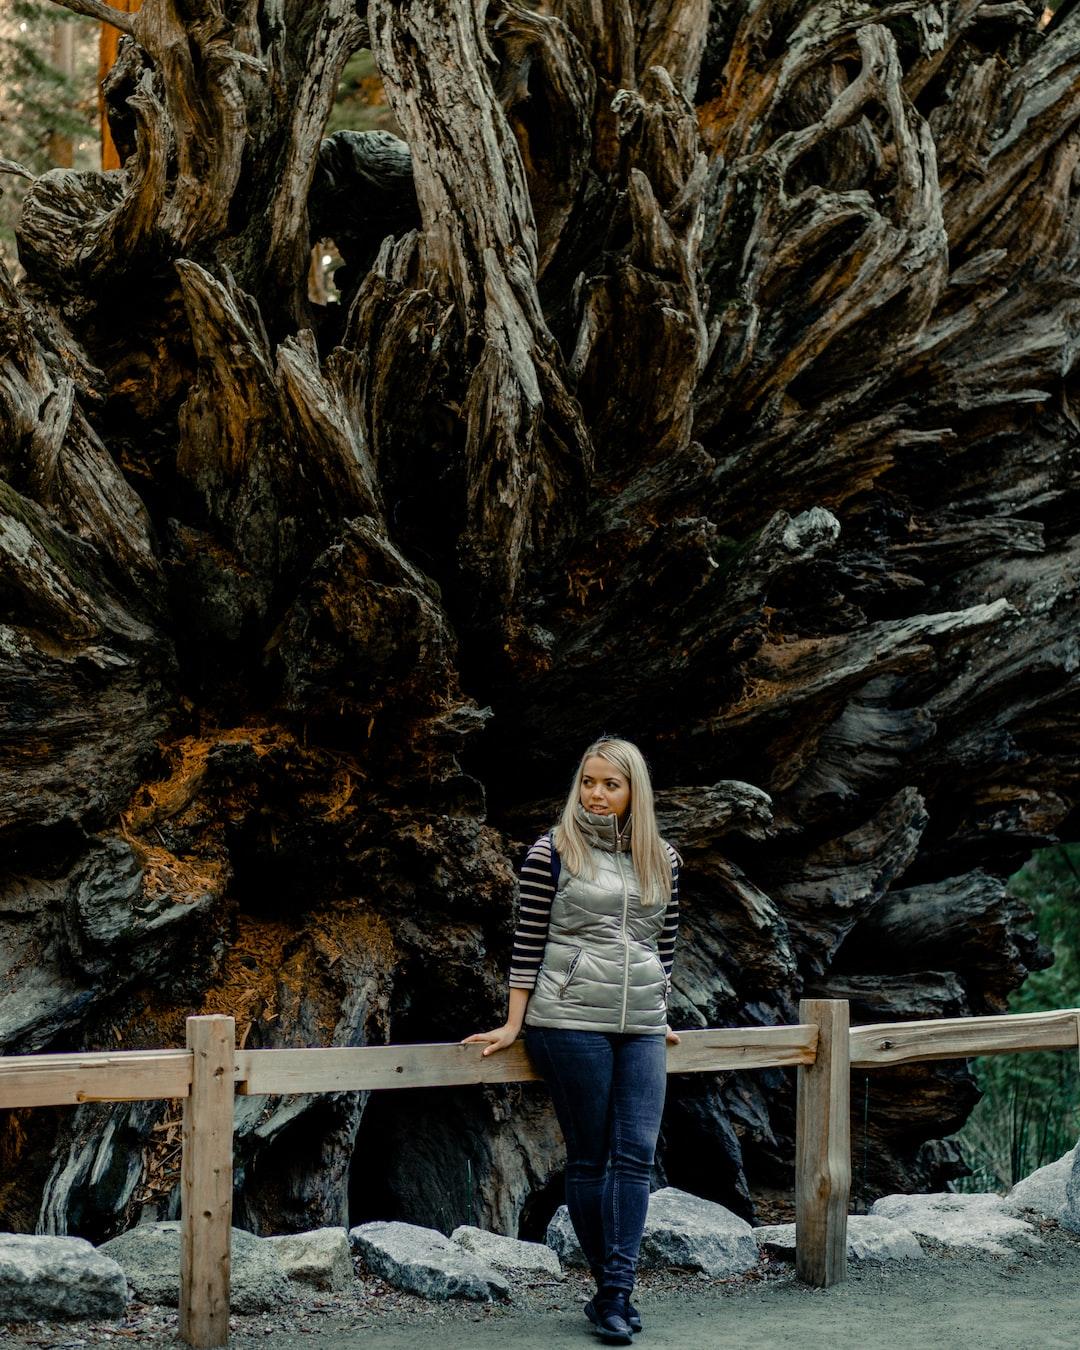 Posing next to a natural wonder